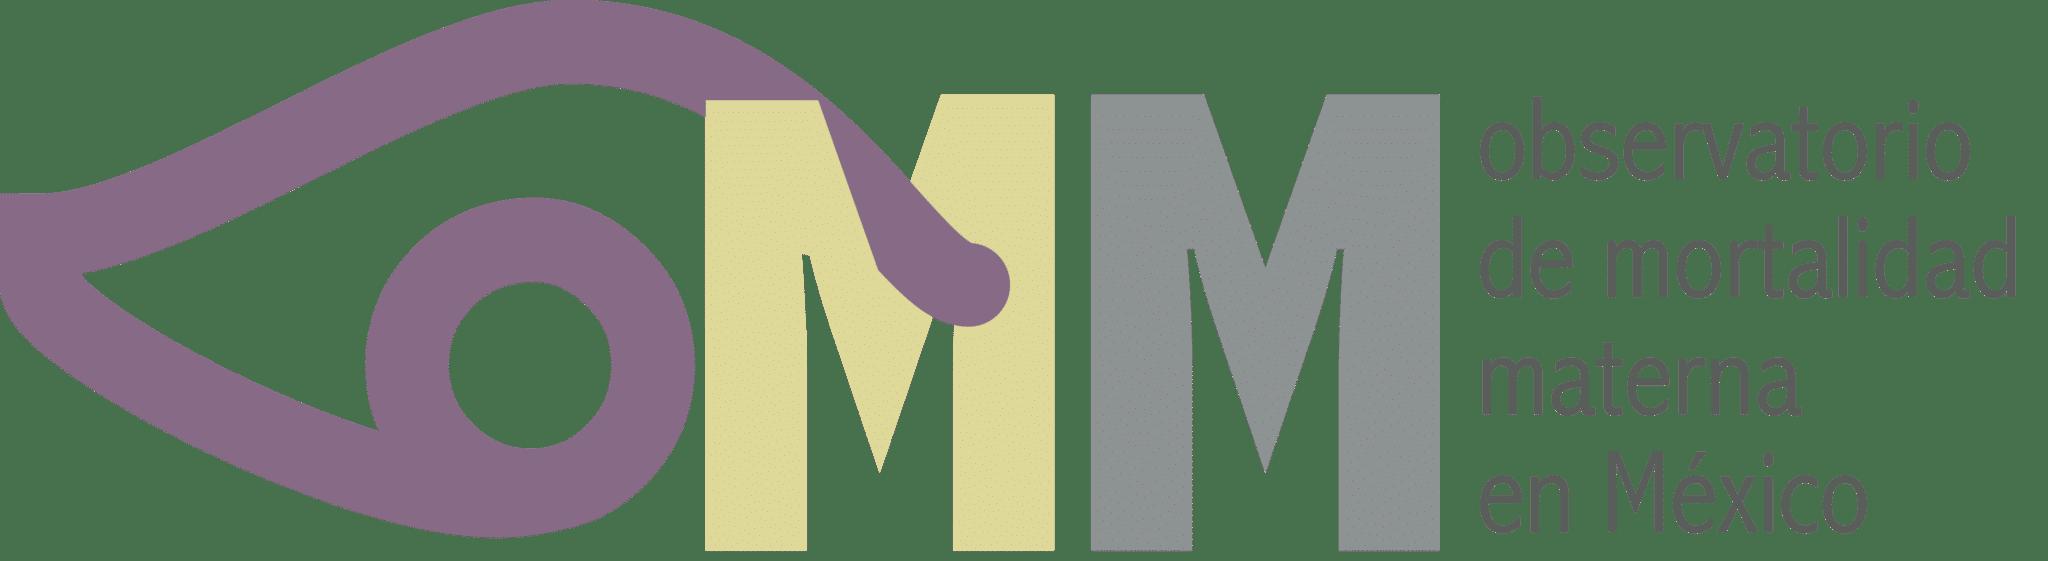 Observatorio de Mortalidad Materna